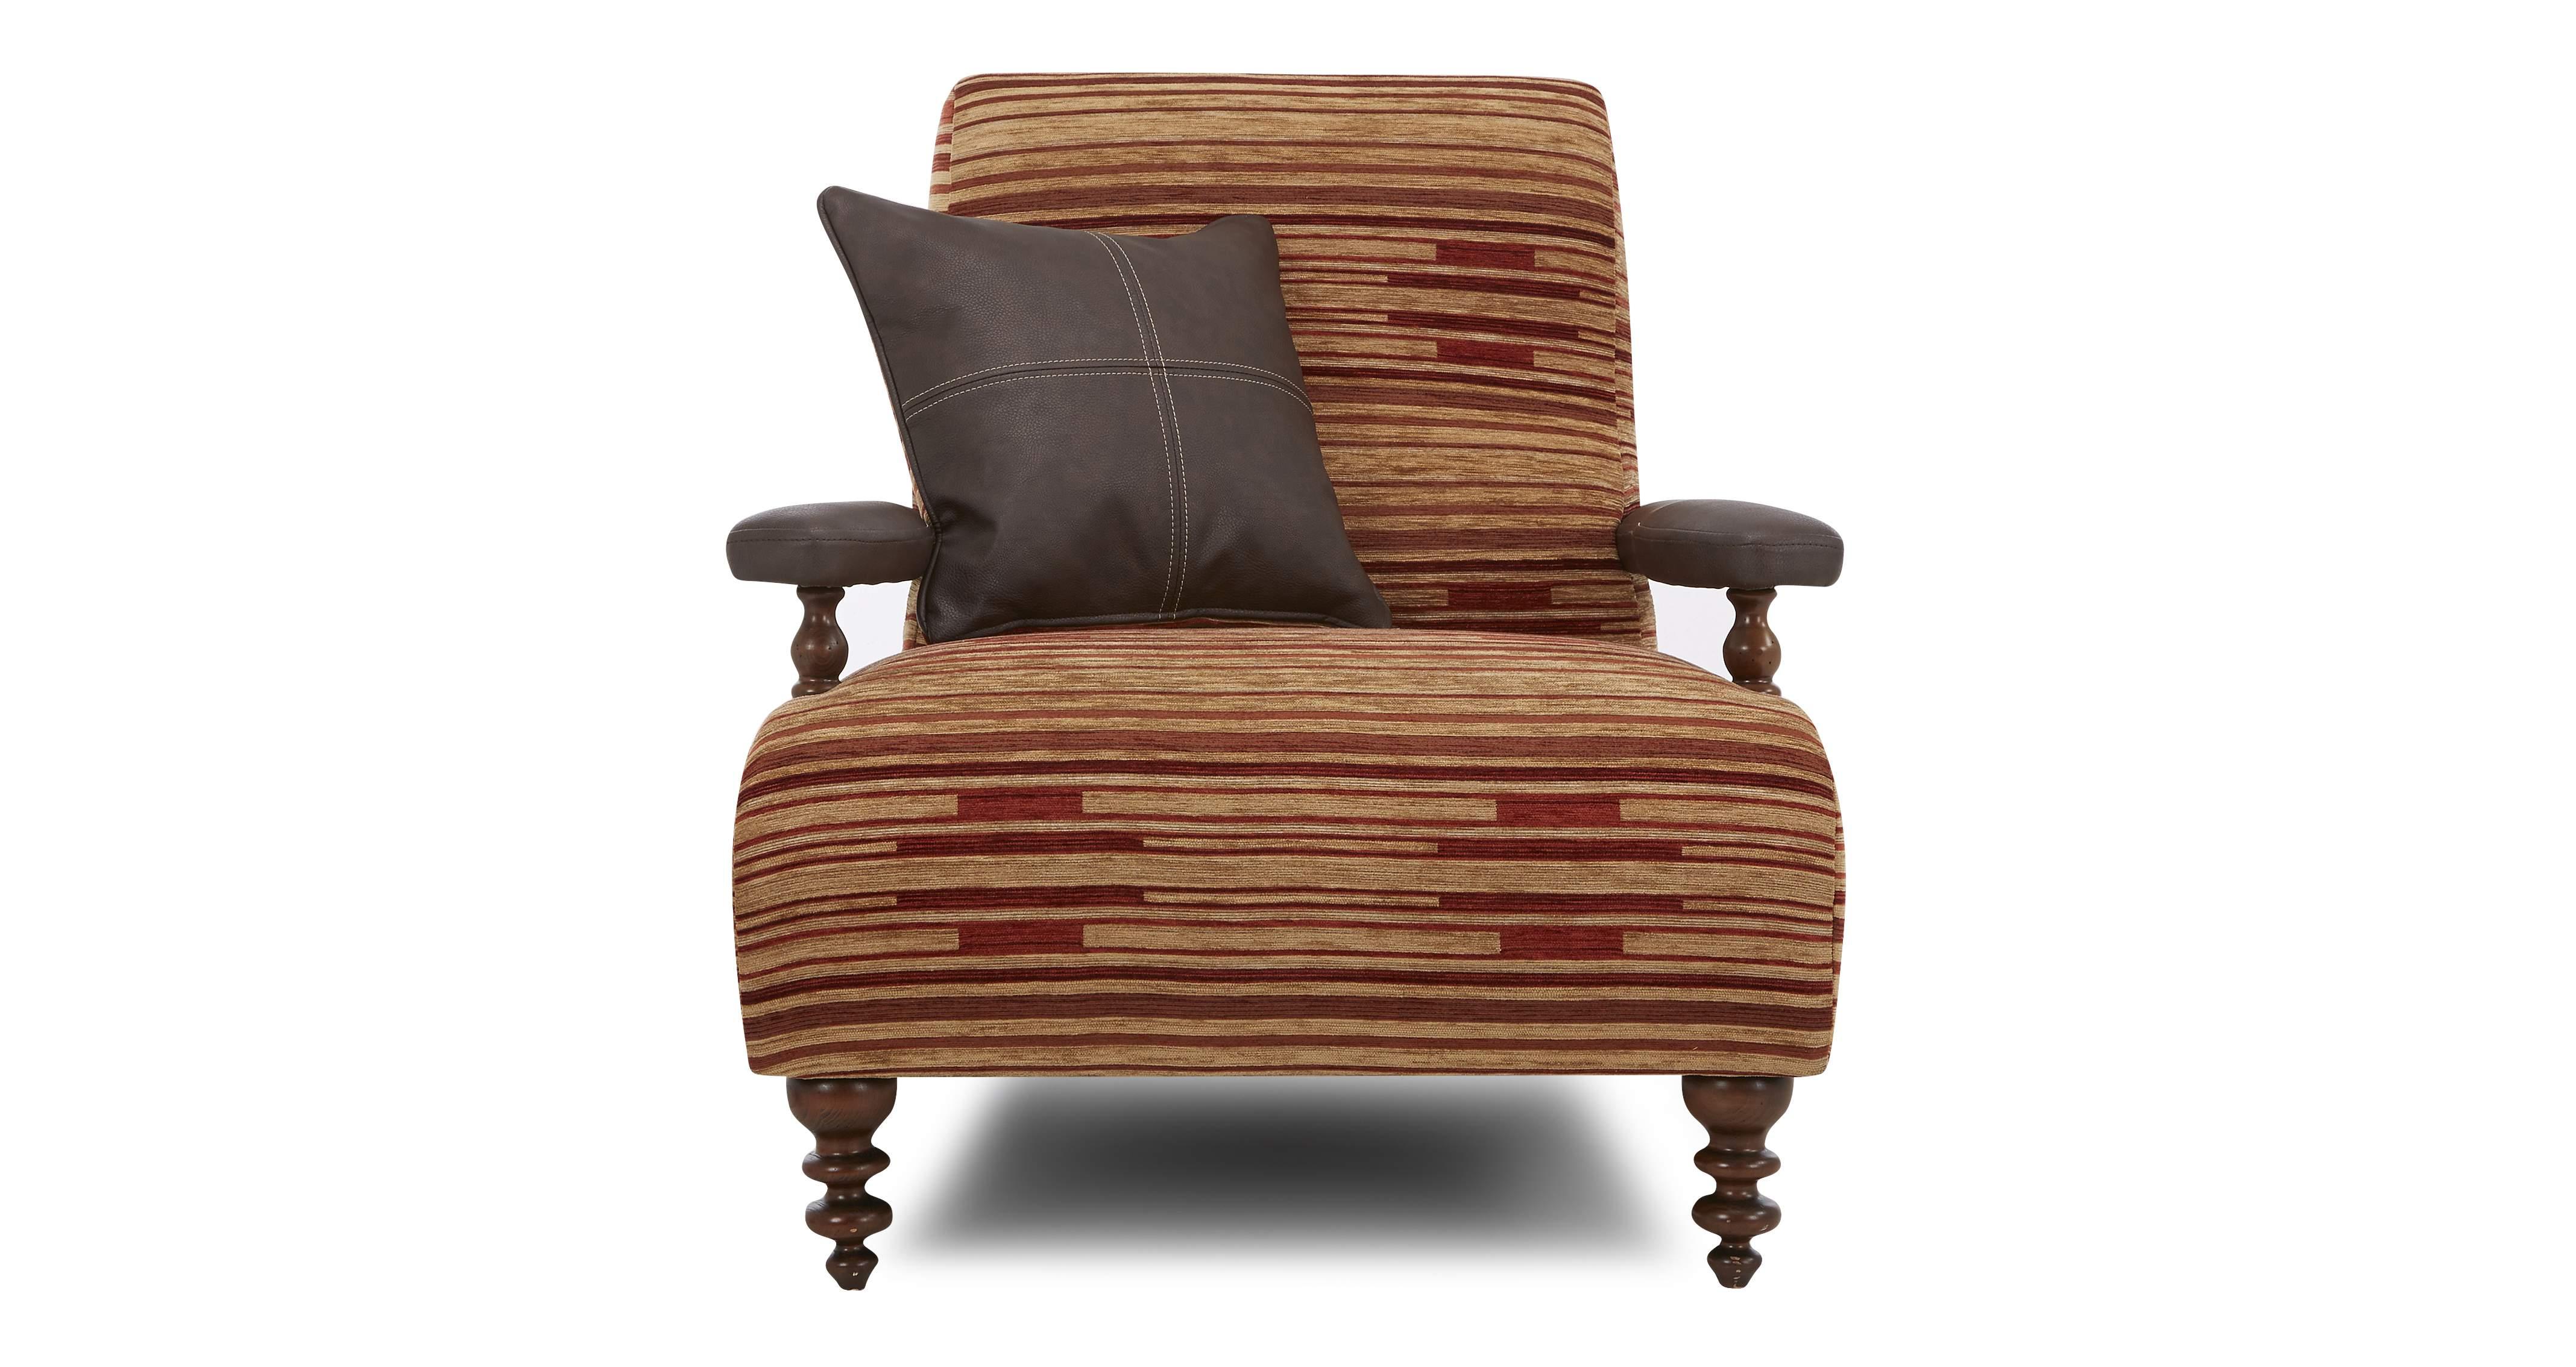 DFS Aztek Set Incl Terracotta Accent Chair and Storage